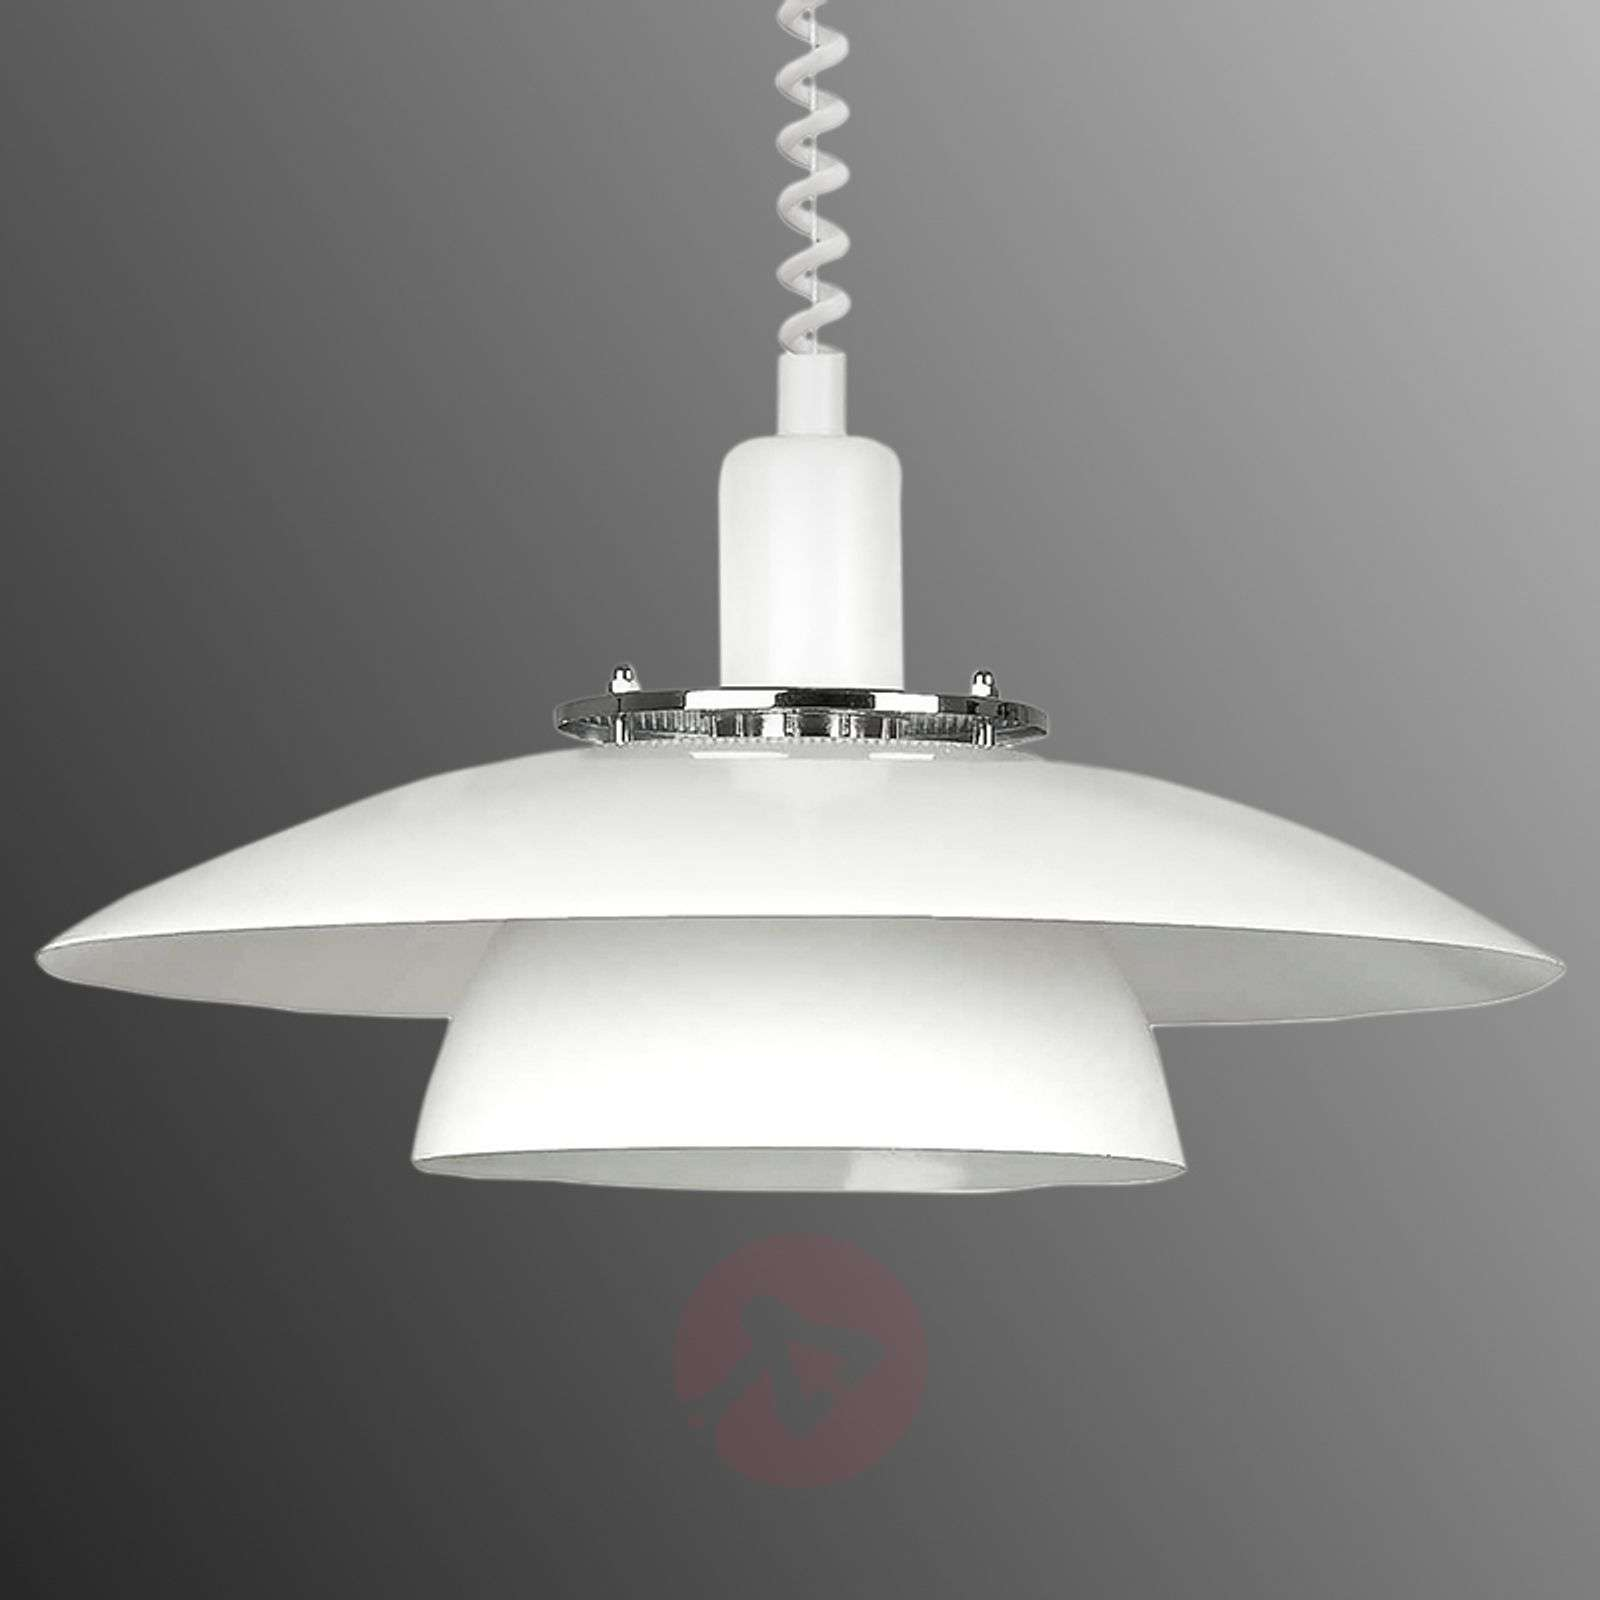 Height adjustable pendant light brenda in white lights height adjustable pendant light brenda in white 3031946 01 aloadofball Image collections